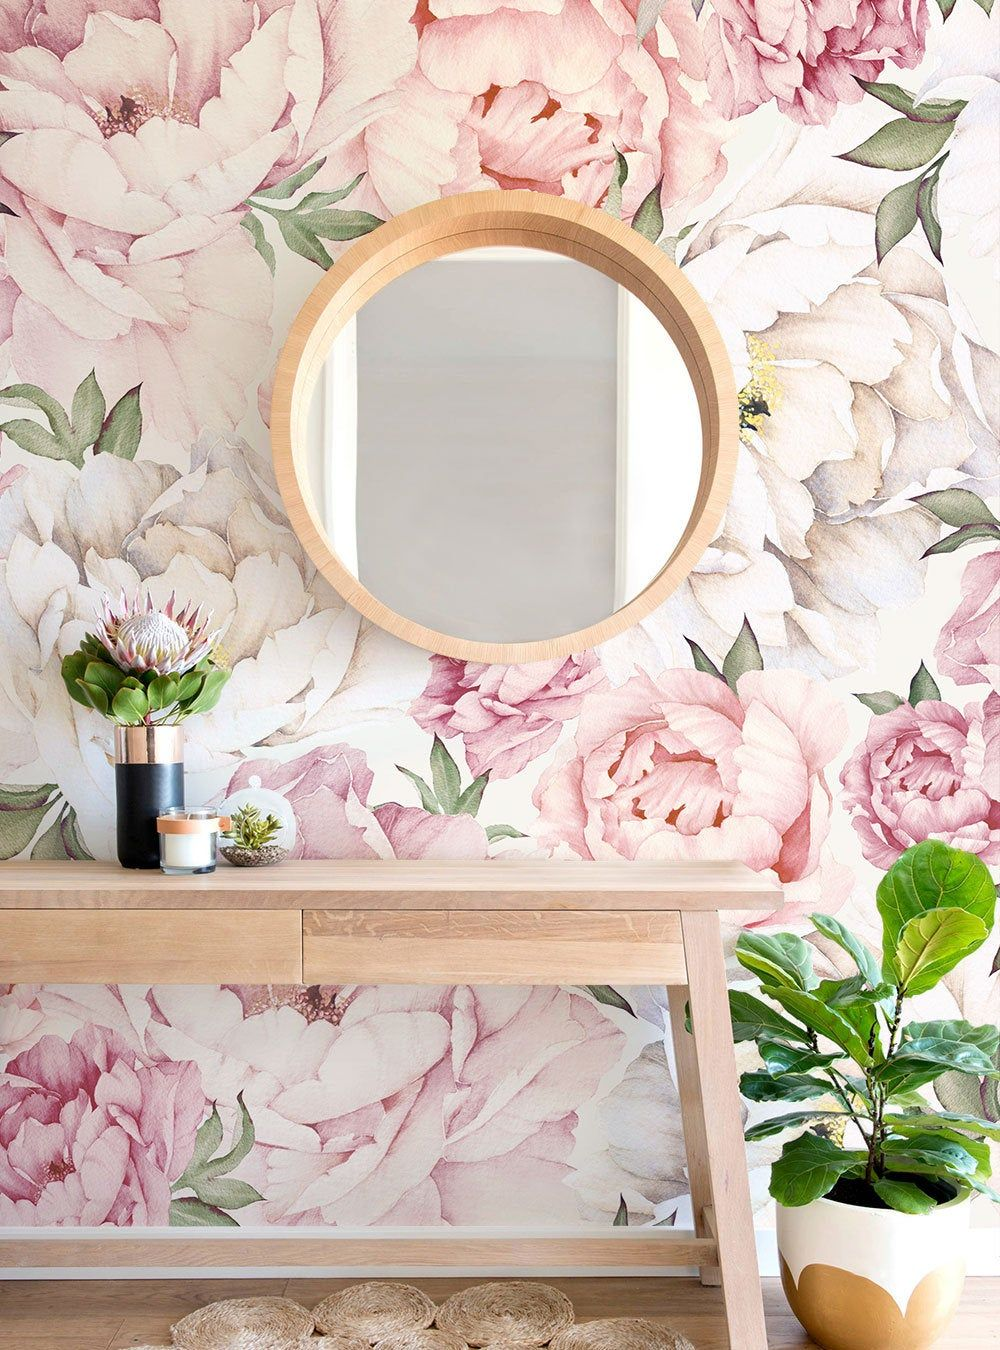 Peony Flower Mural Wallpaper, Rosa Mixto, Acuarela Peonía